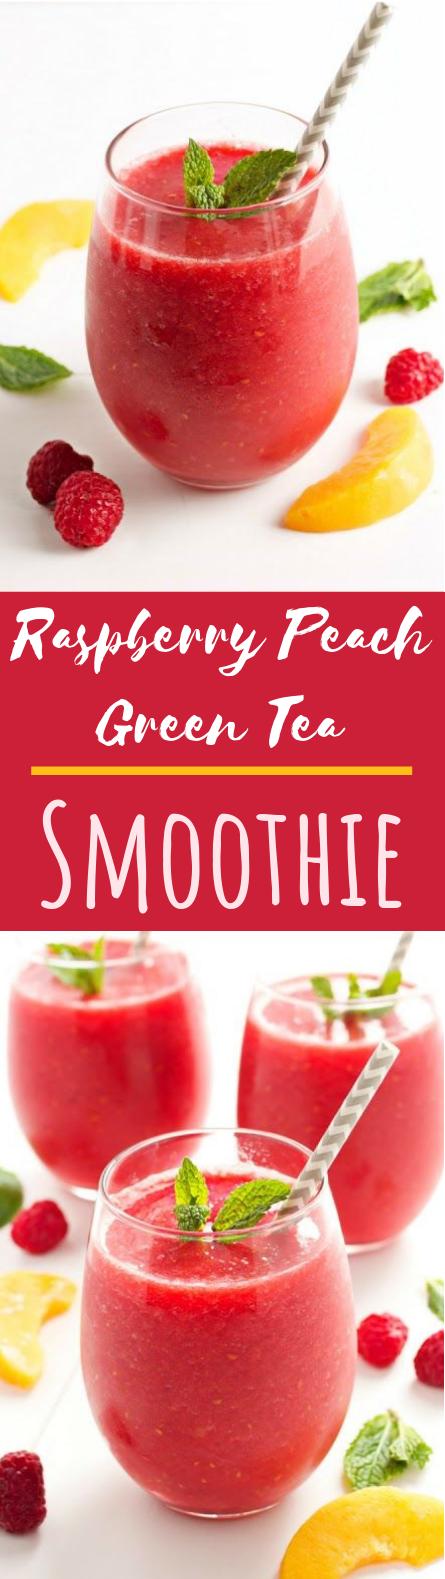 Raspberry Peach Green Tea Smoothie #healthy #drinks